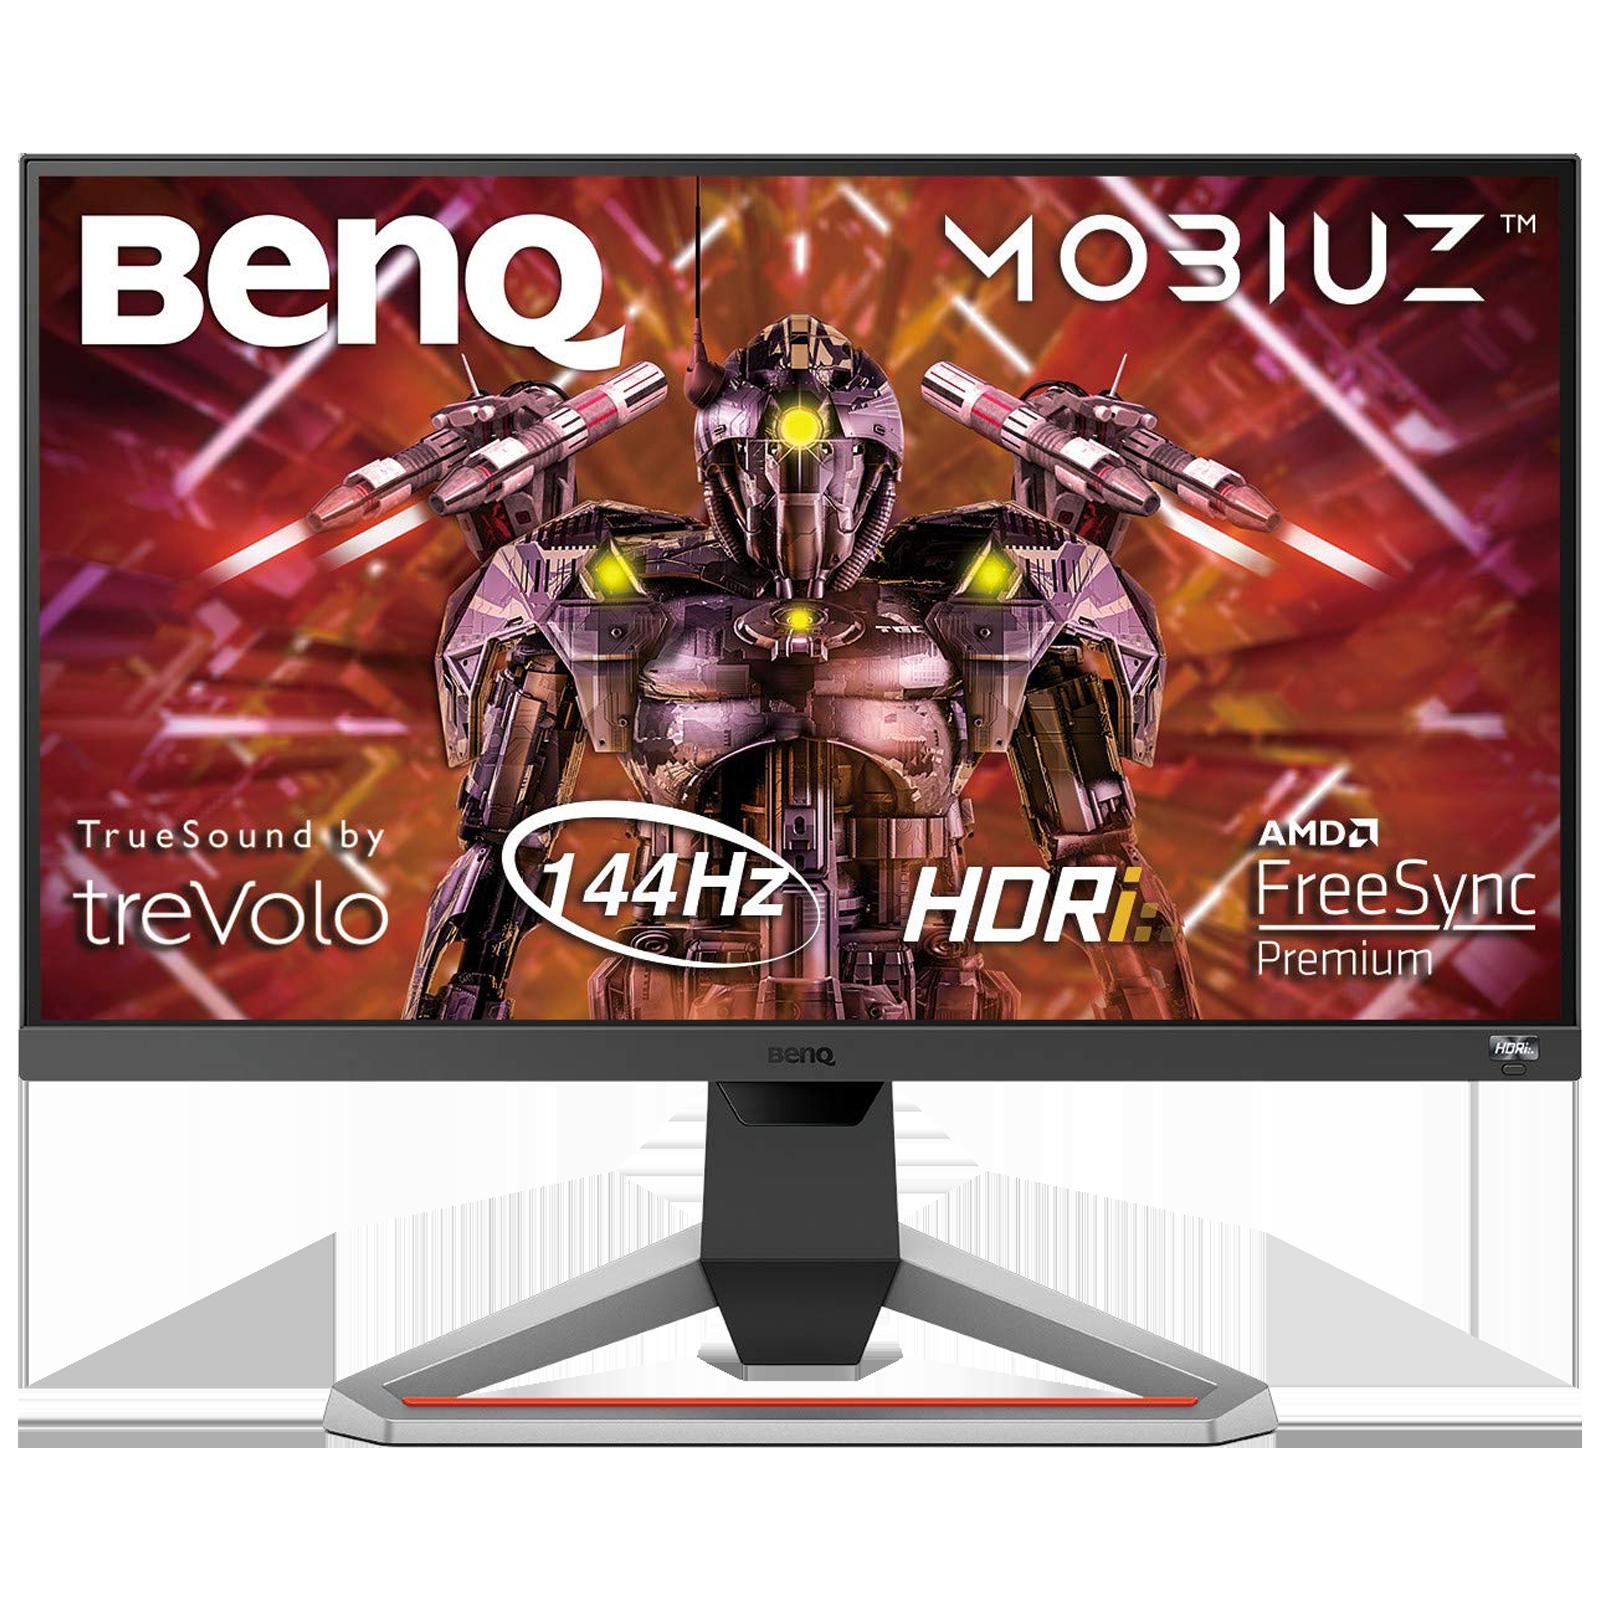 BenQ 62.23cm (24.5 Inches) Full HD IPS Screen Gaming Monitor (Brightness Intelligence Plus Technology, HDMI + Display Port, 144 Hz, EX2510, Black)_1